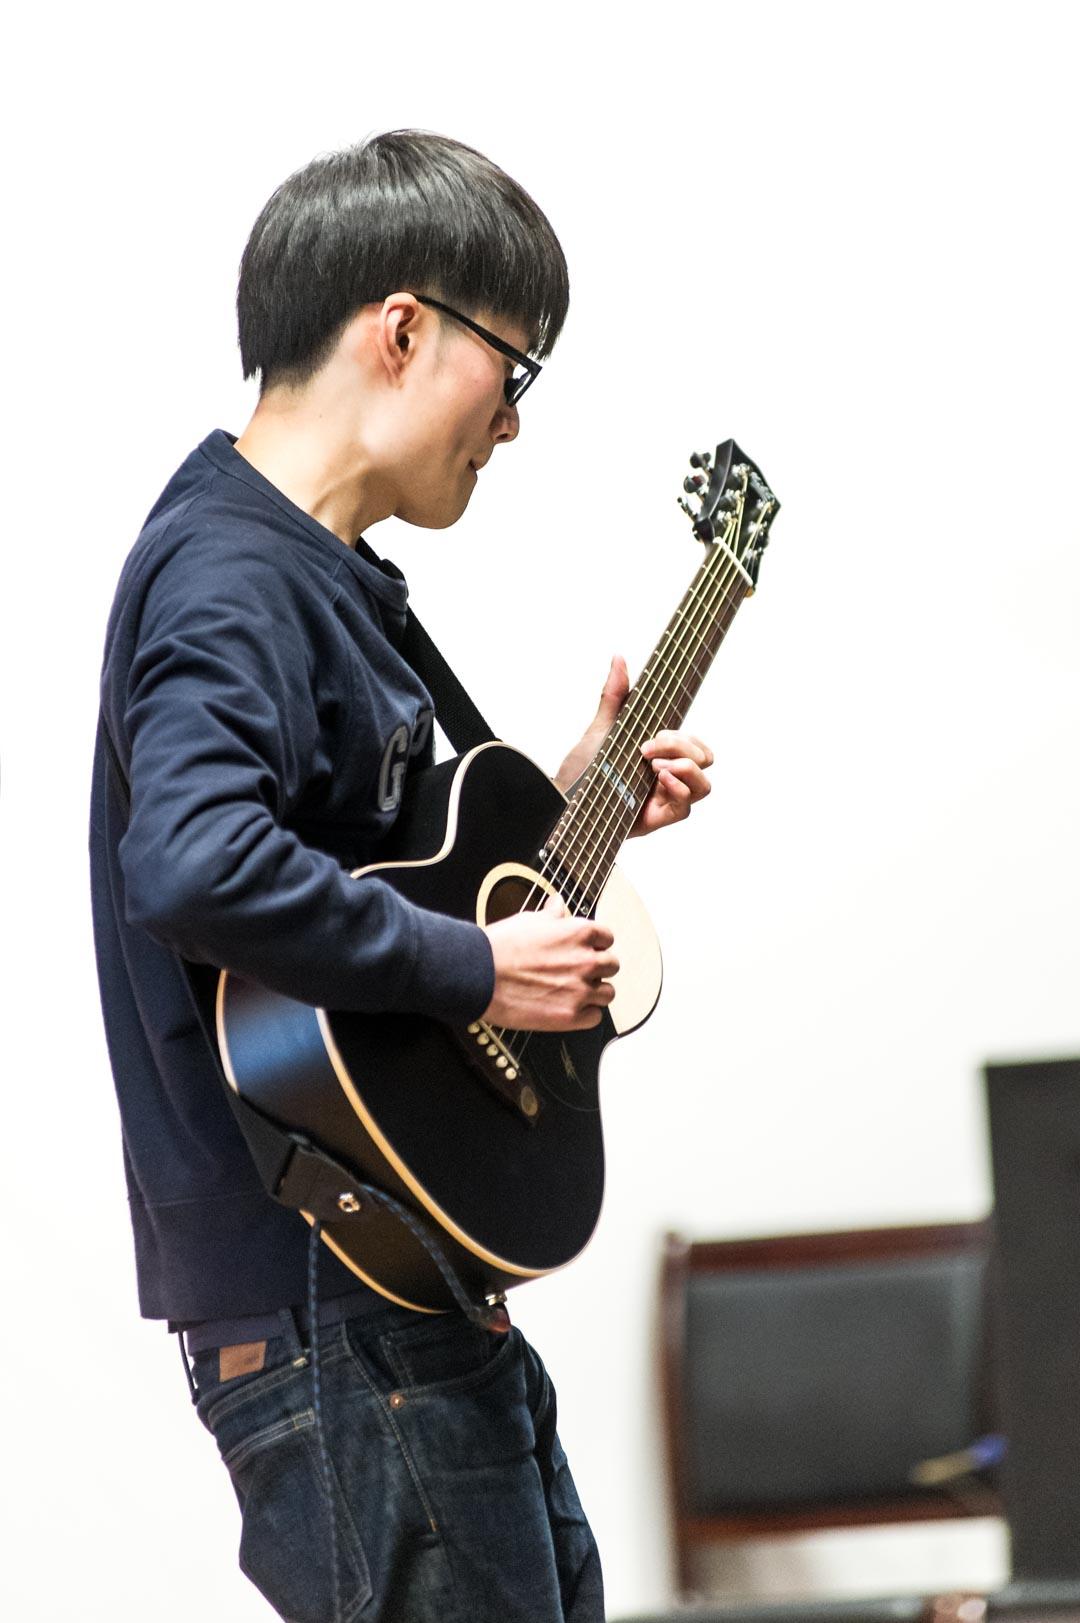 D3S_6875-Edit 沈骏阳